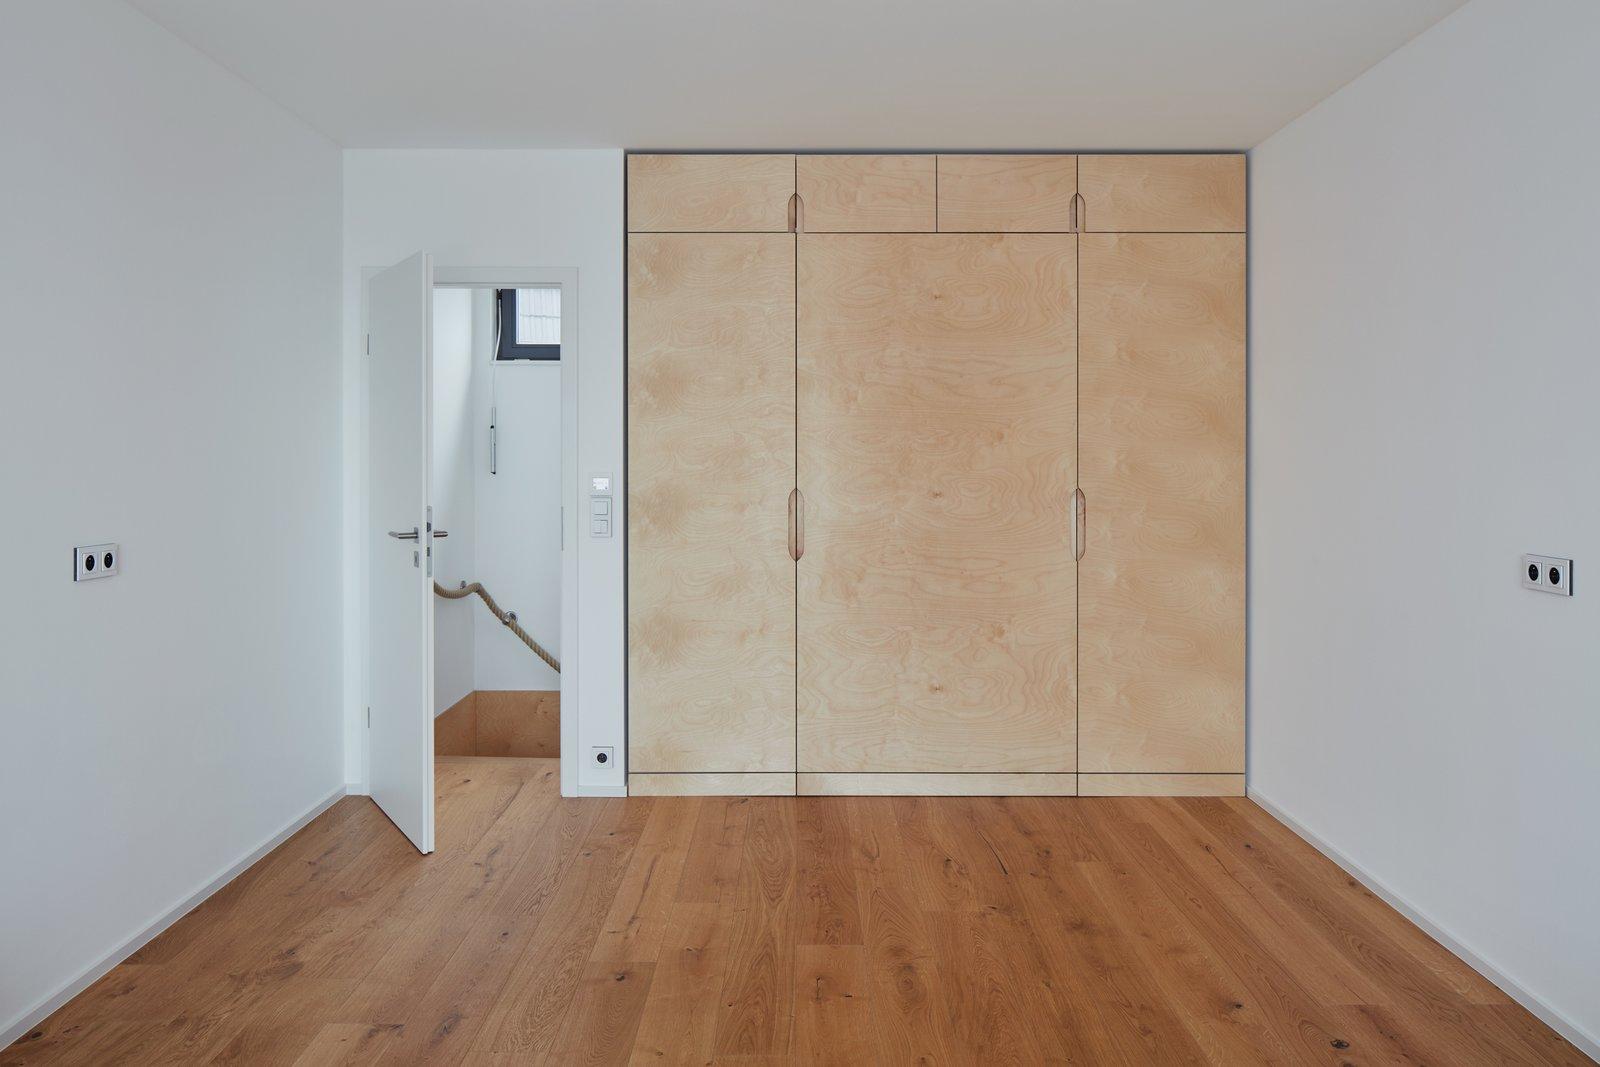 Bedroom, Wardrobe, Bed, Ceiling Lighting, and Medium Hardwood Floor  Freedomek No.061 by BoysPlayNice Photography & Concept